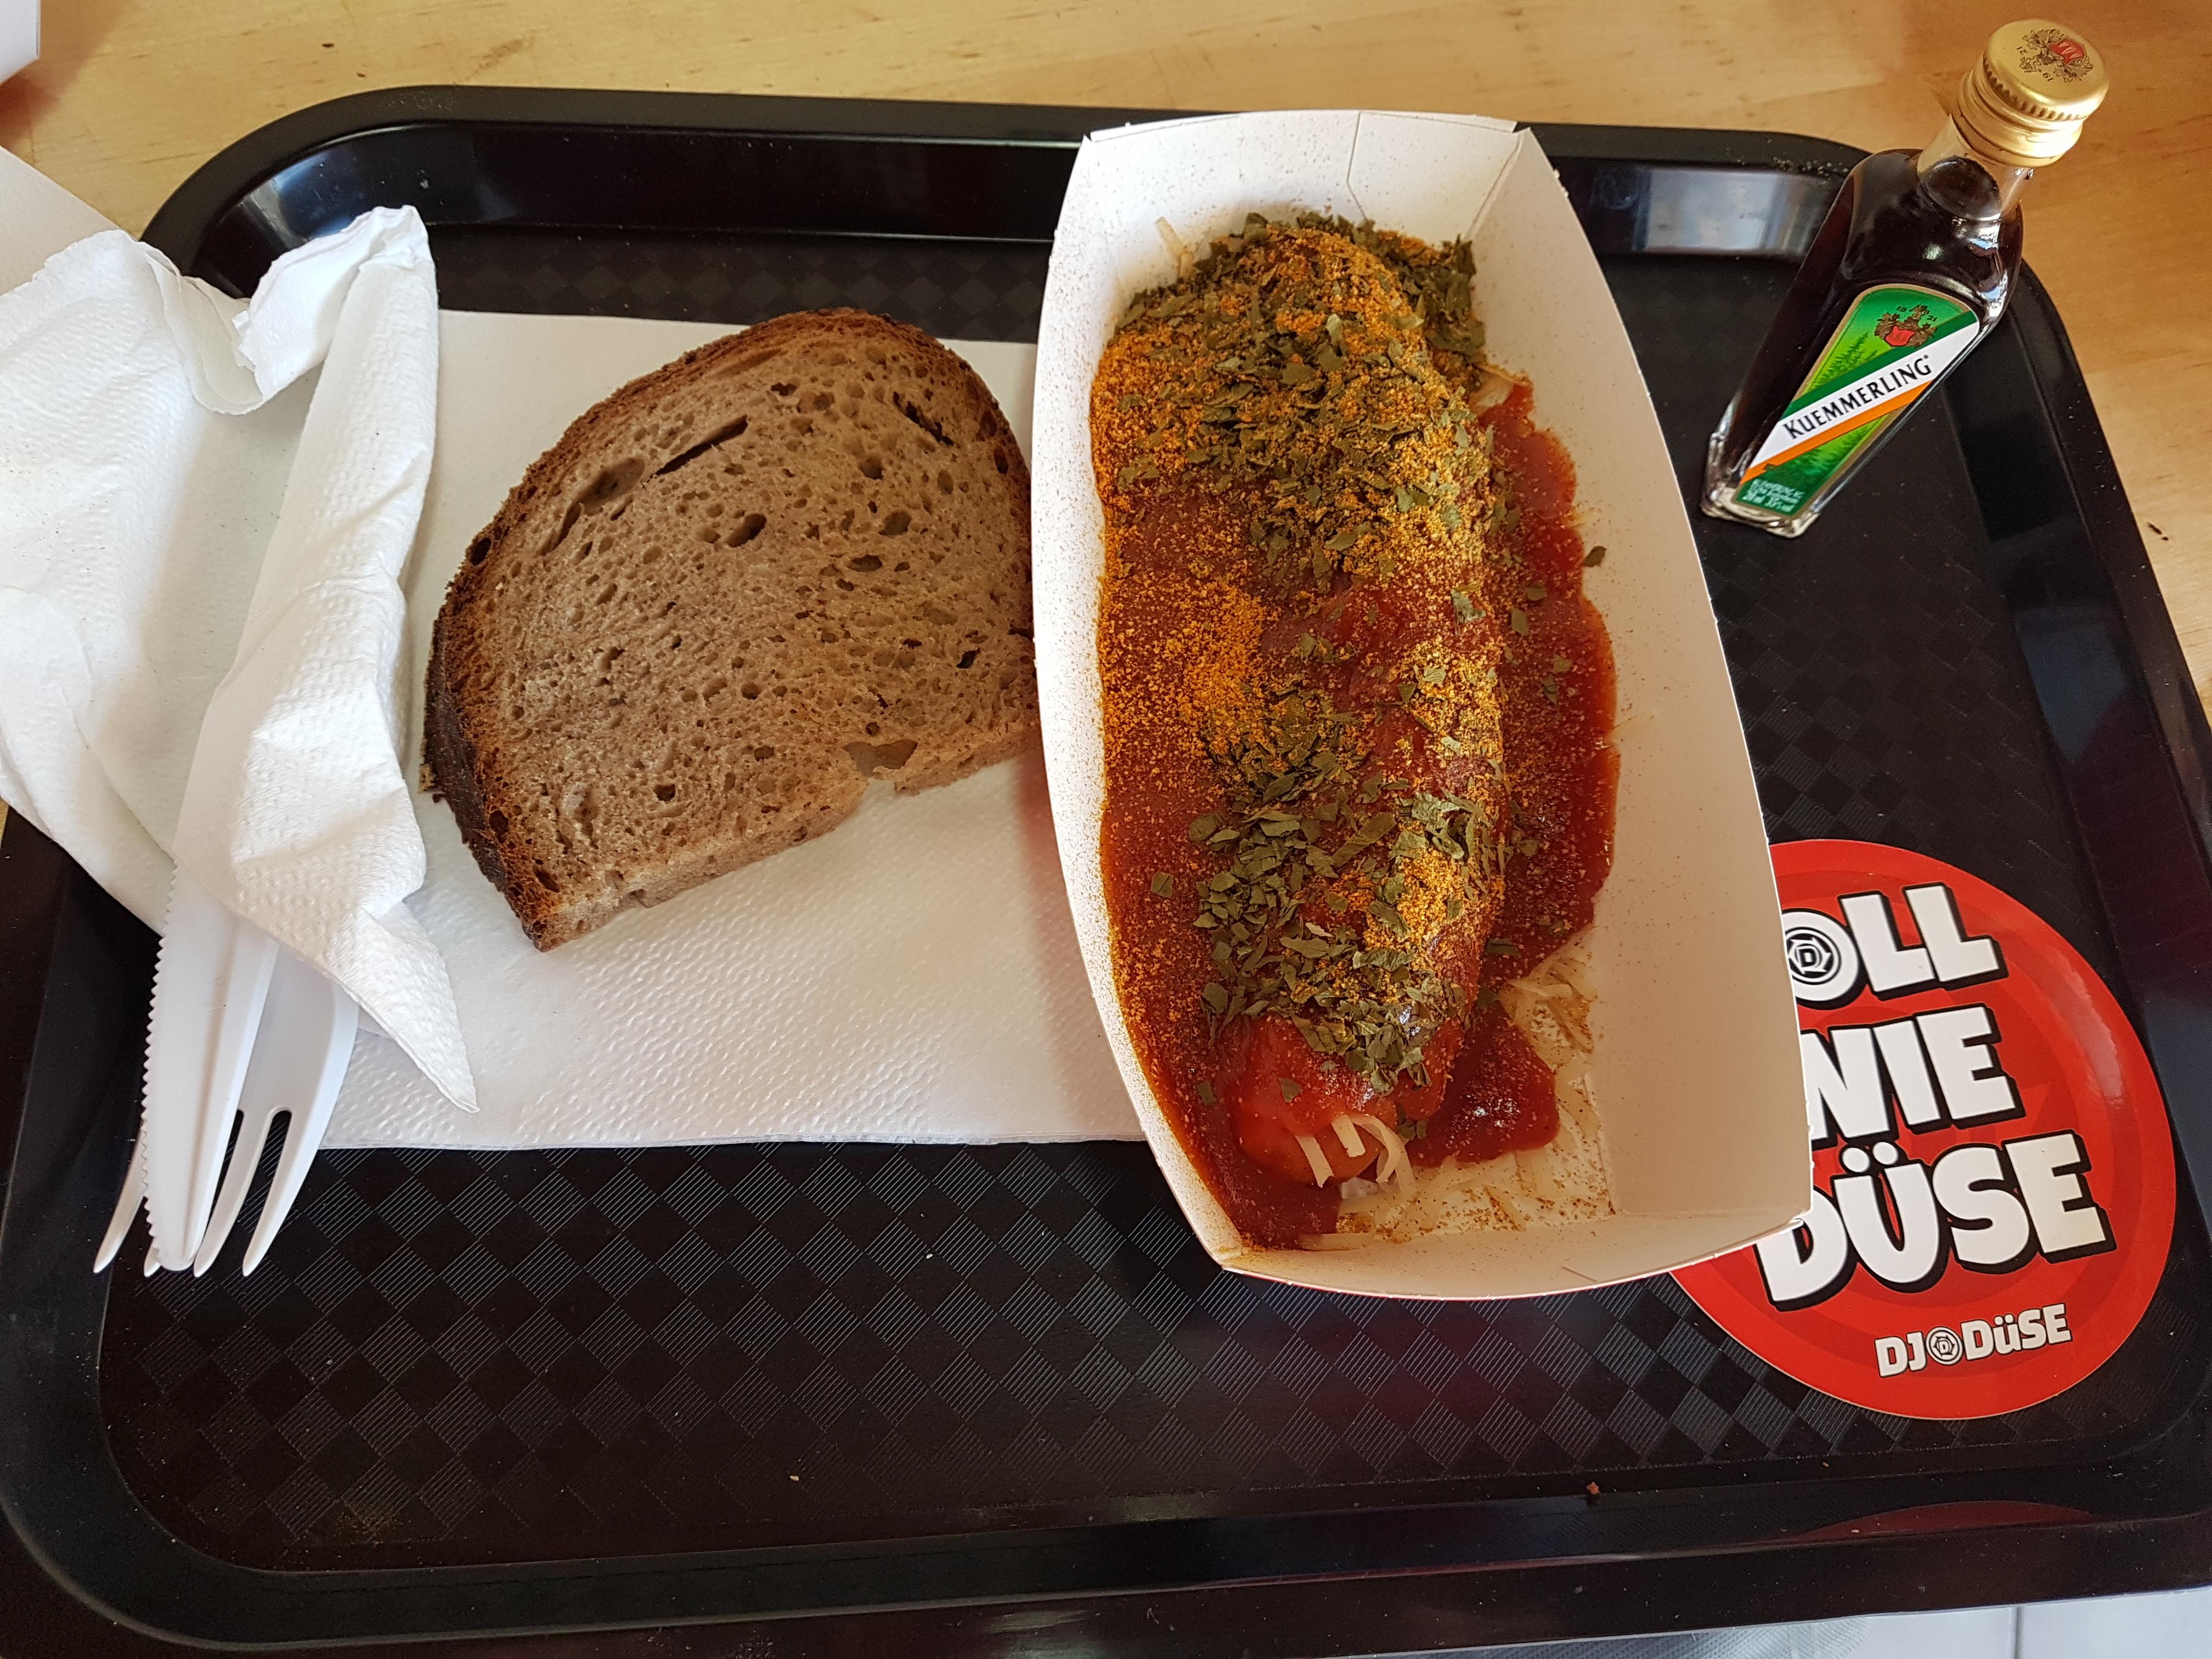 http://foodloader.net/Holz_2017-04-21_DJ_Duese_Wurst.jpg